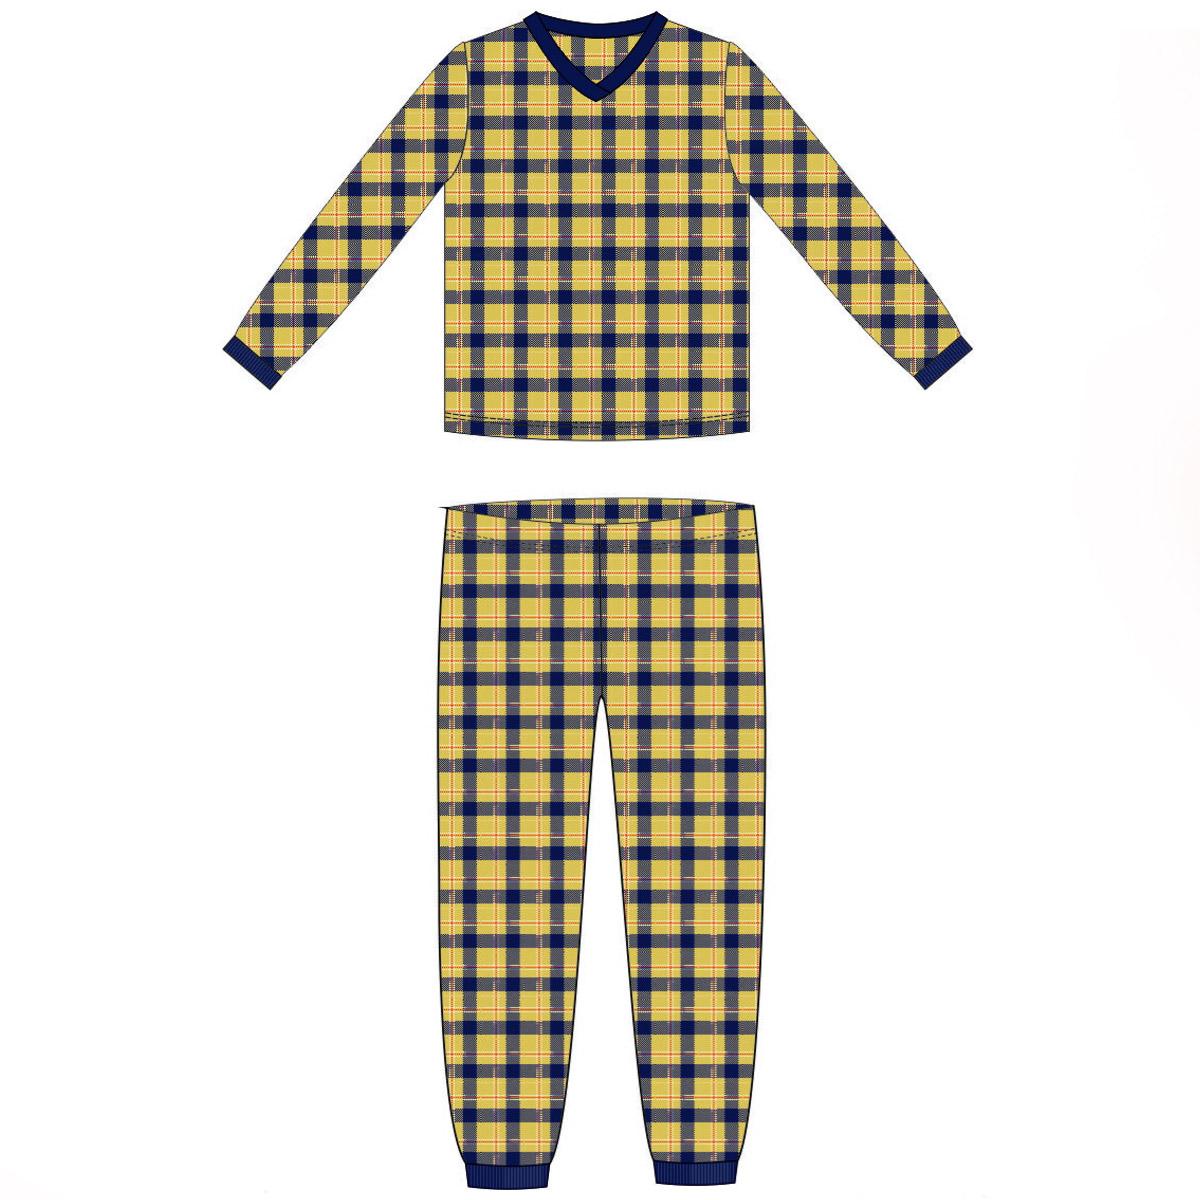 Пижама для мальчика Ёмаё (18-301) рост 98 клетка бежевая<br>